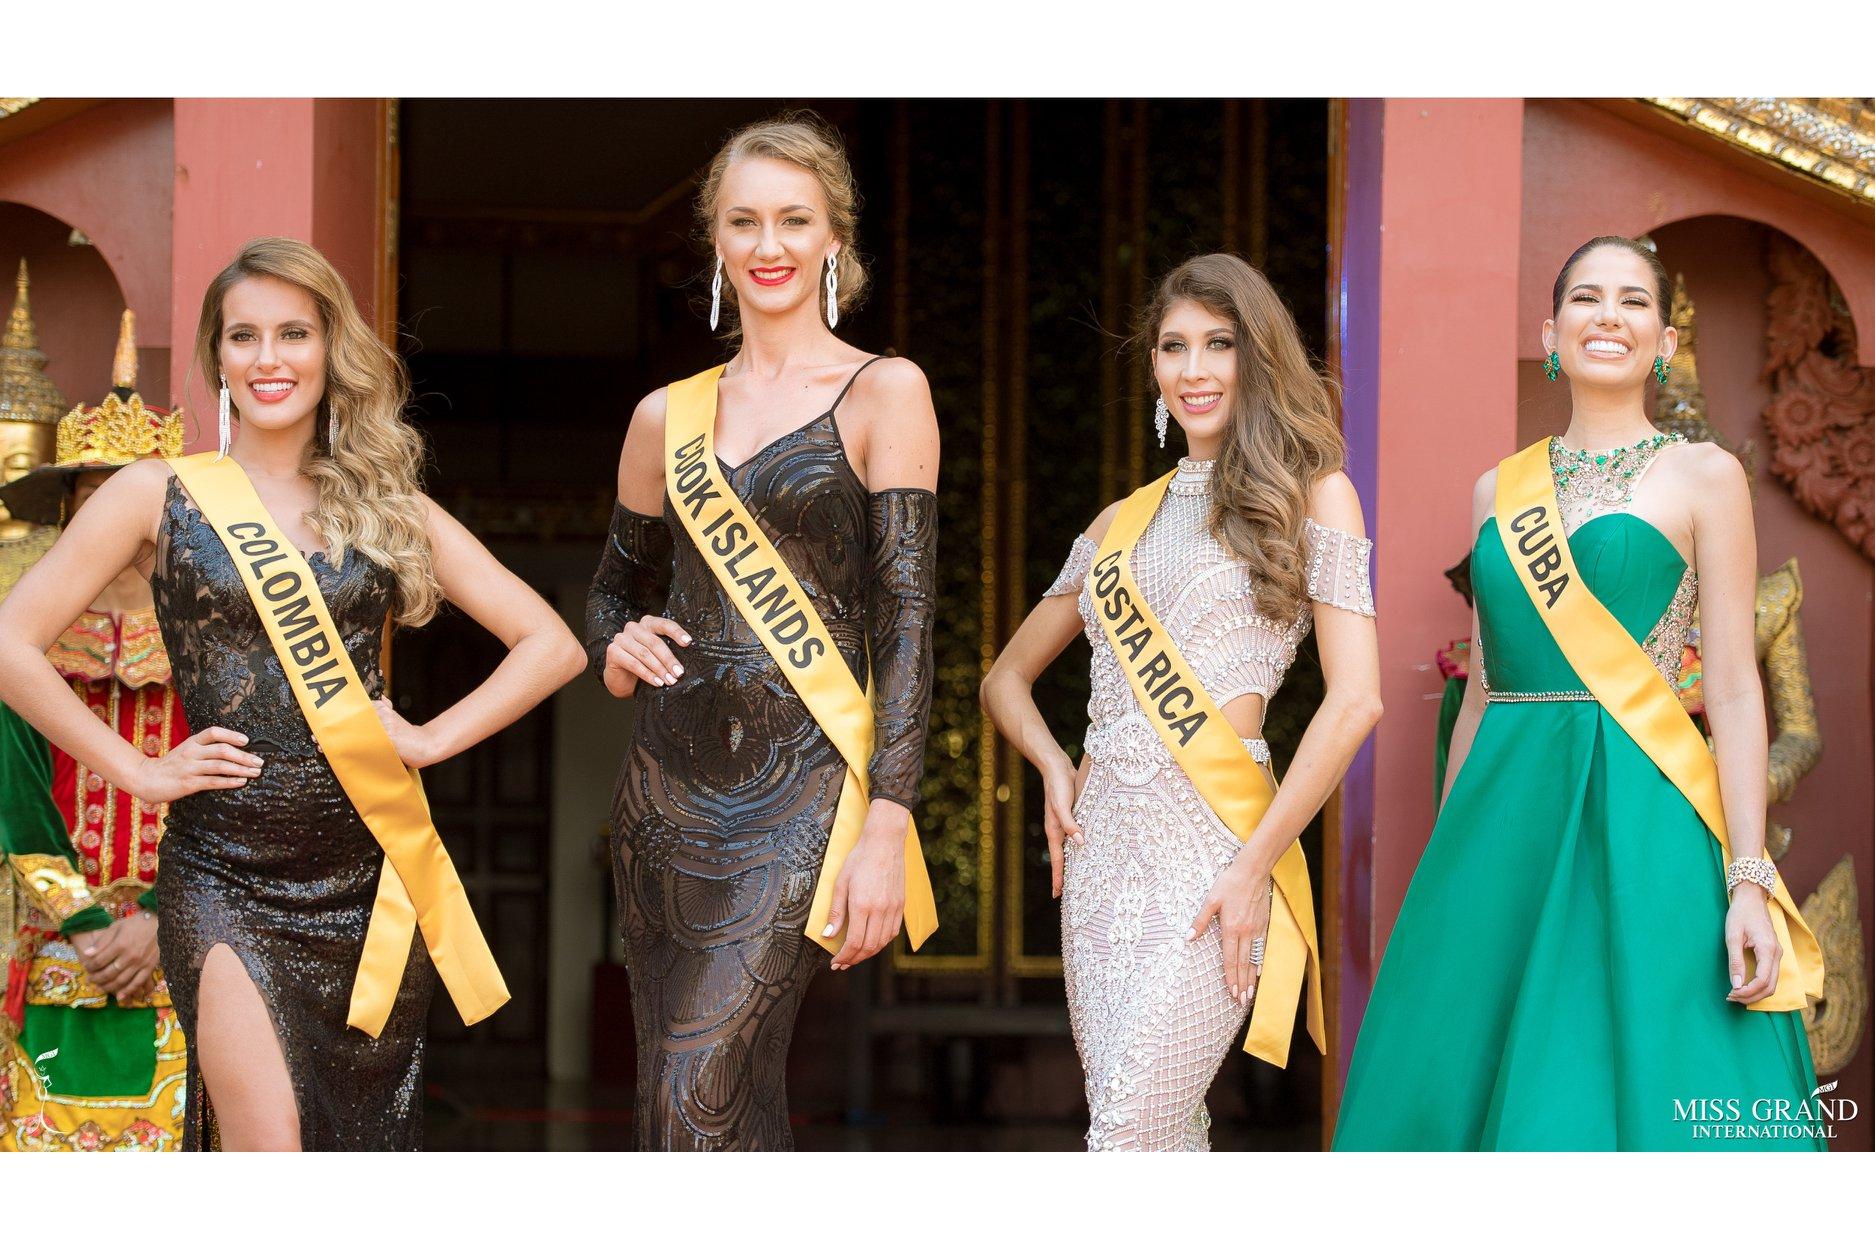 sheyla quizena, miss grand colombia 2018. - Página 4 43346210